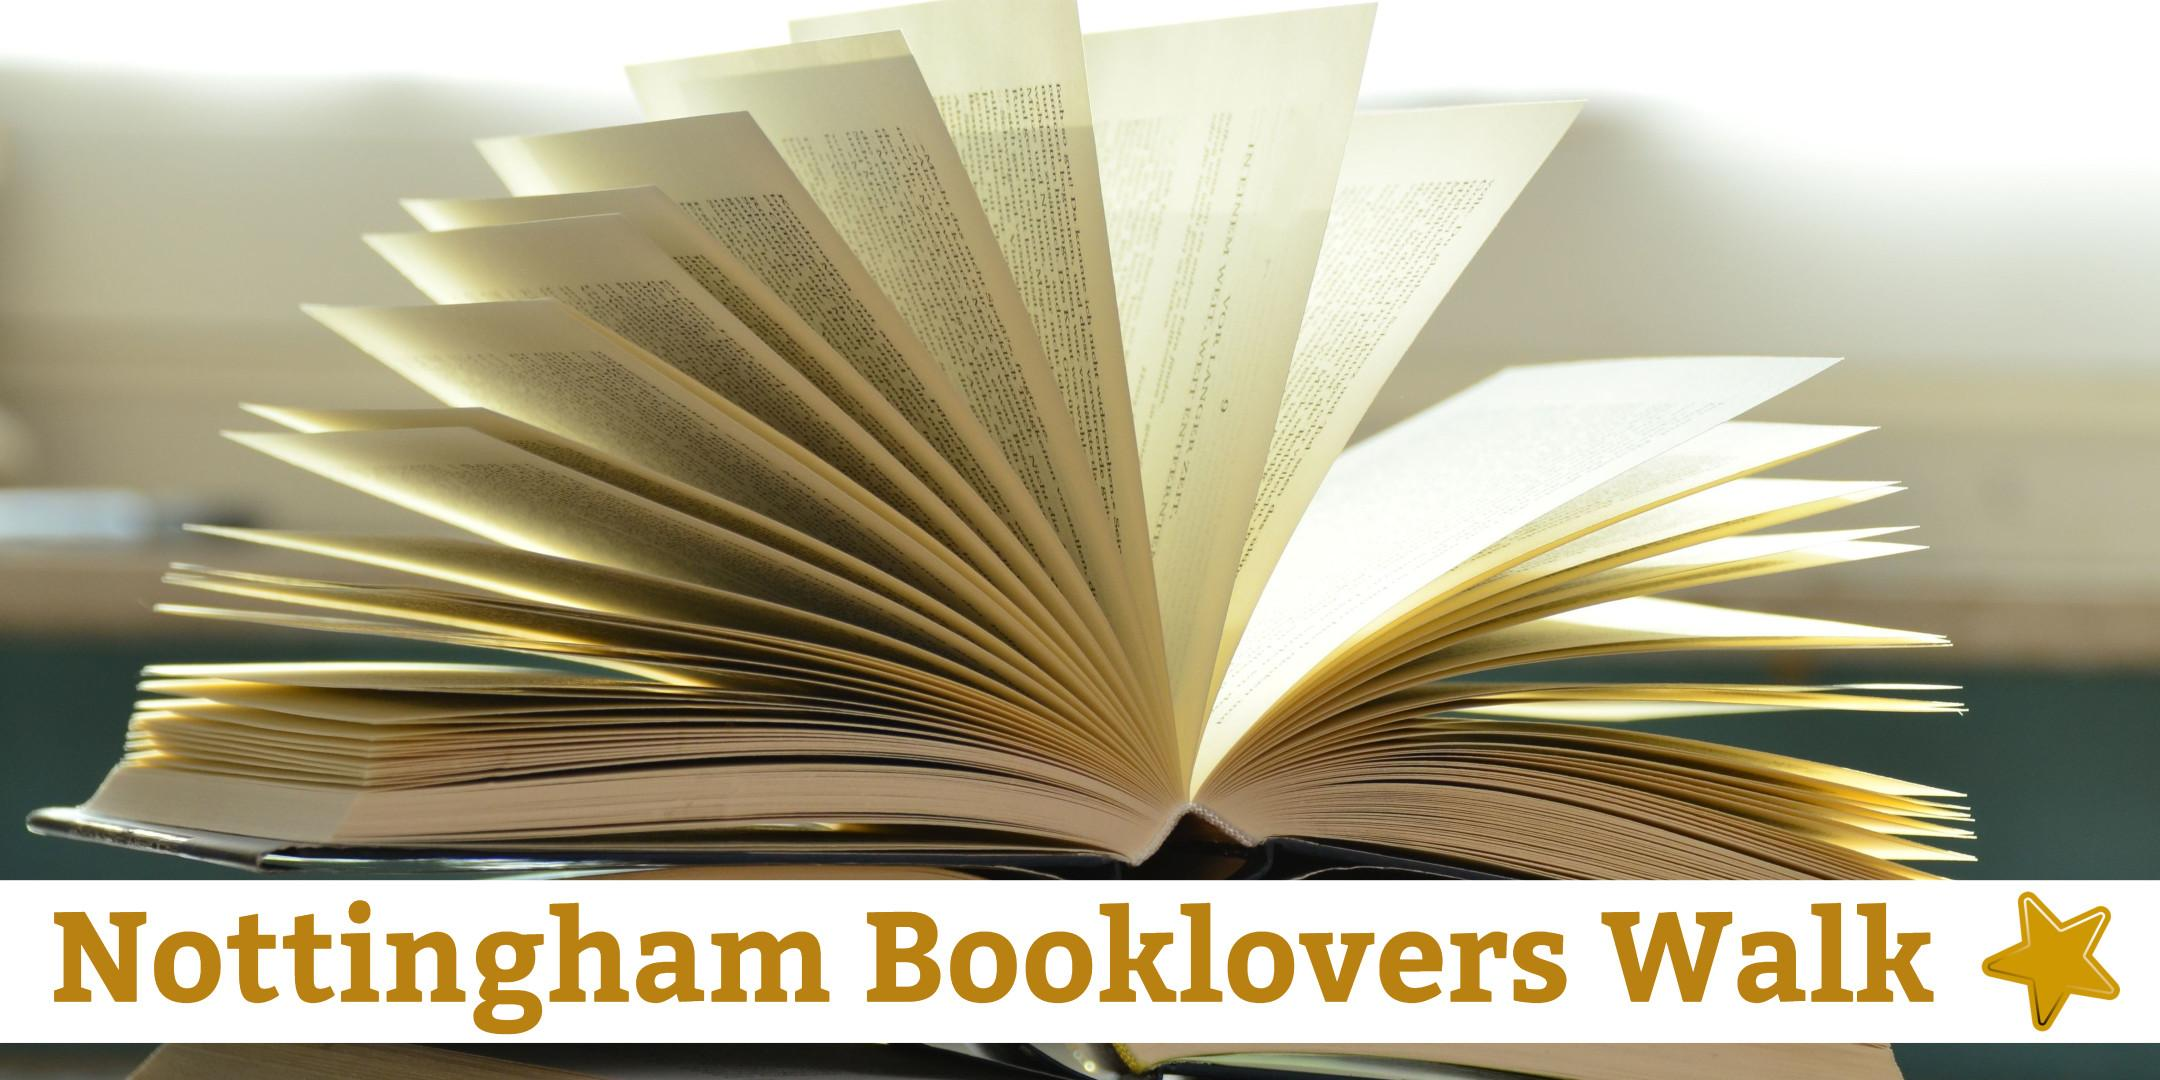 Nottingham Booklovers Walk